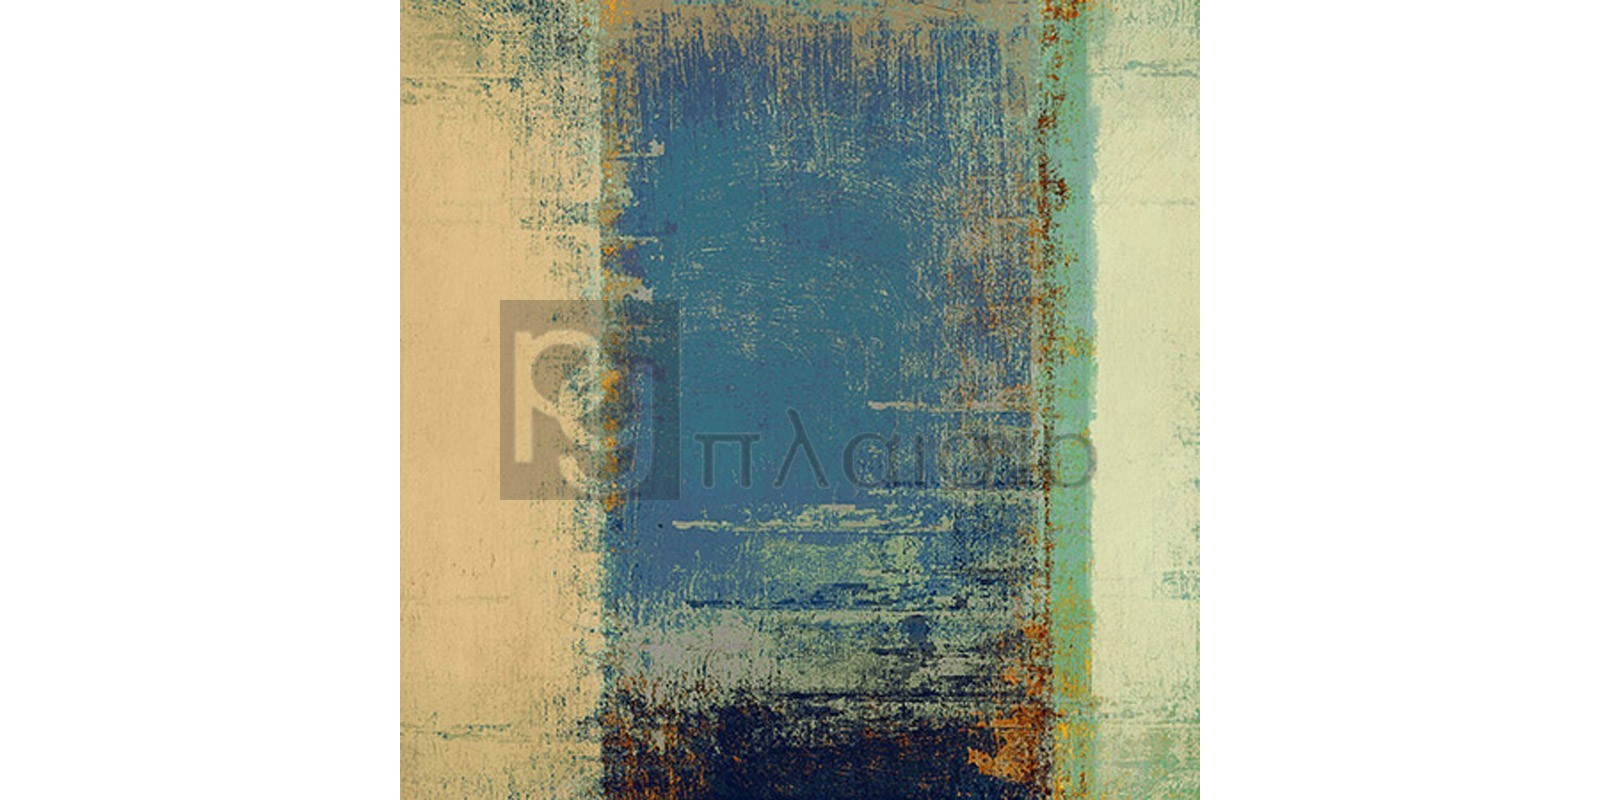 Ruggero Falcone - Rainbow Segment I